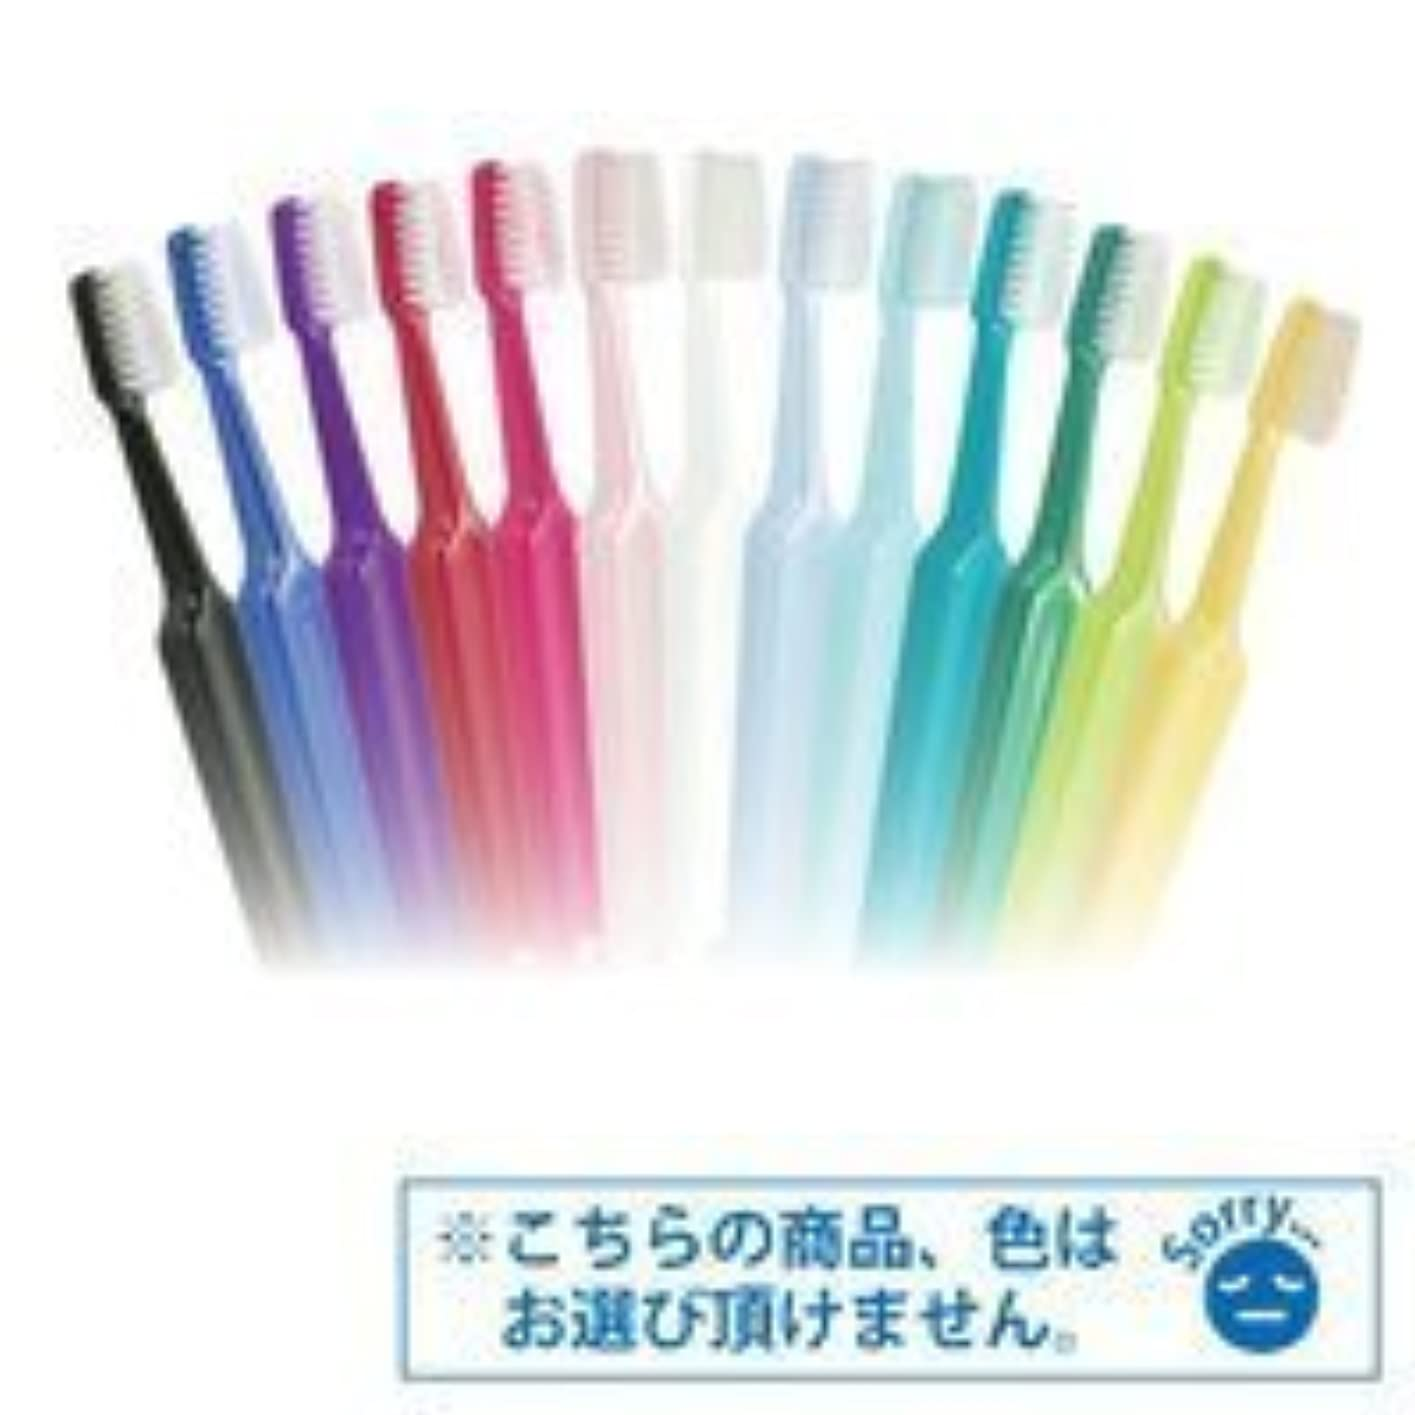 Tepe歯ブラシ セレクトミニ/ソフト 5本入り